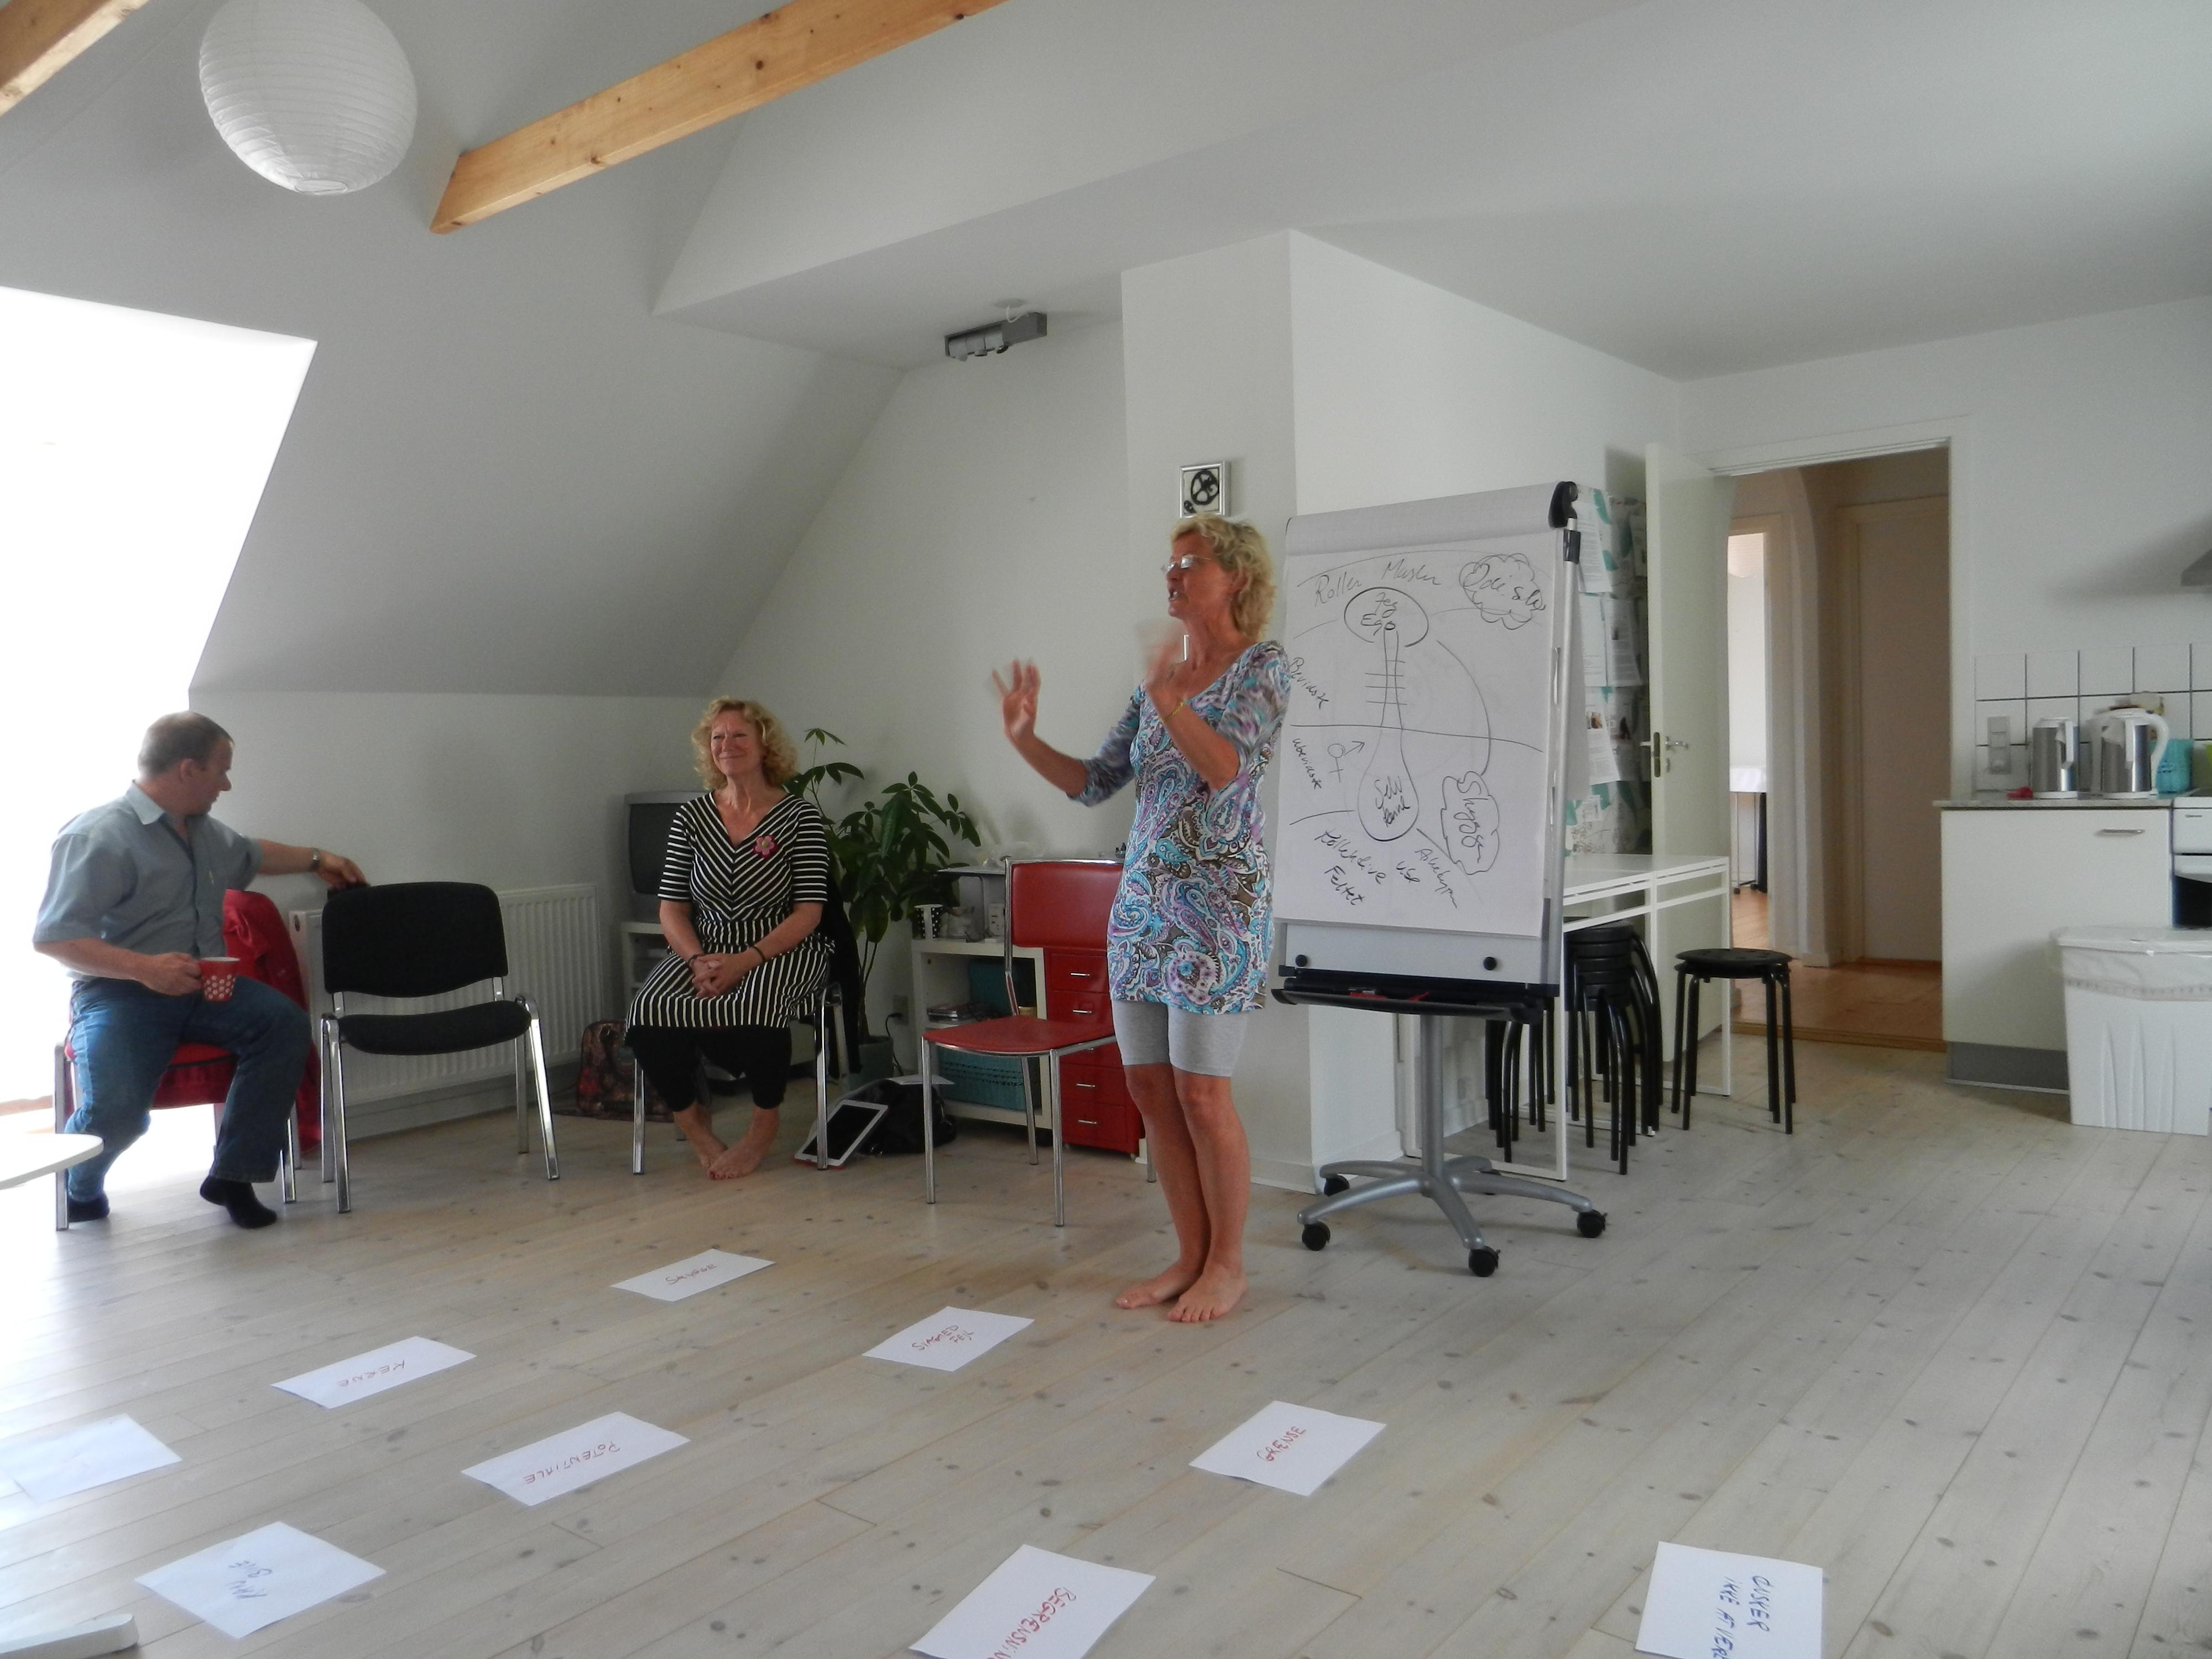 Next Generation NLP, formidler Inge, Yes2Life Silkeborg DK